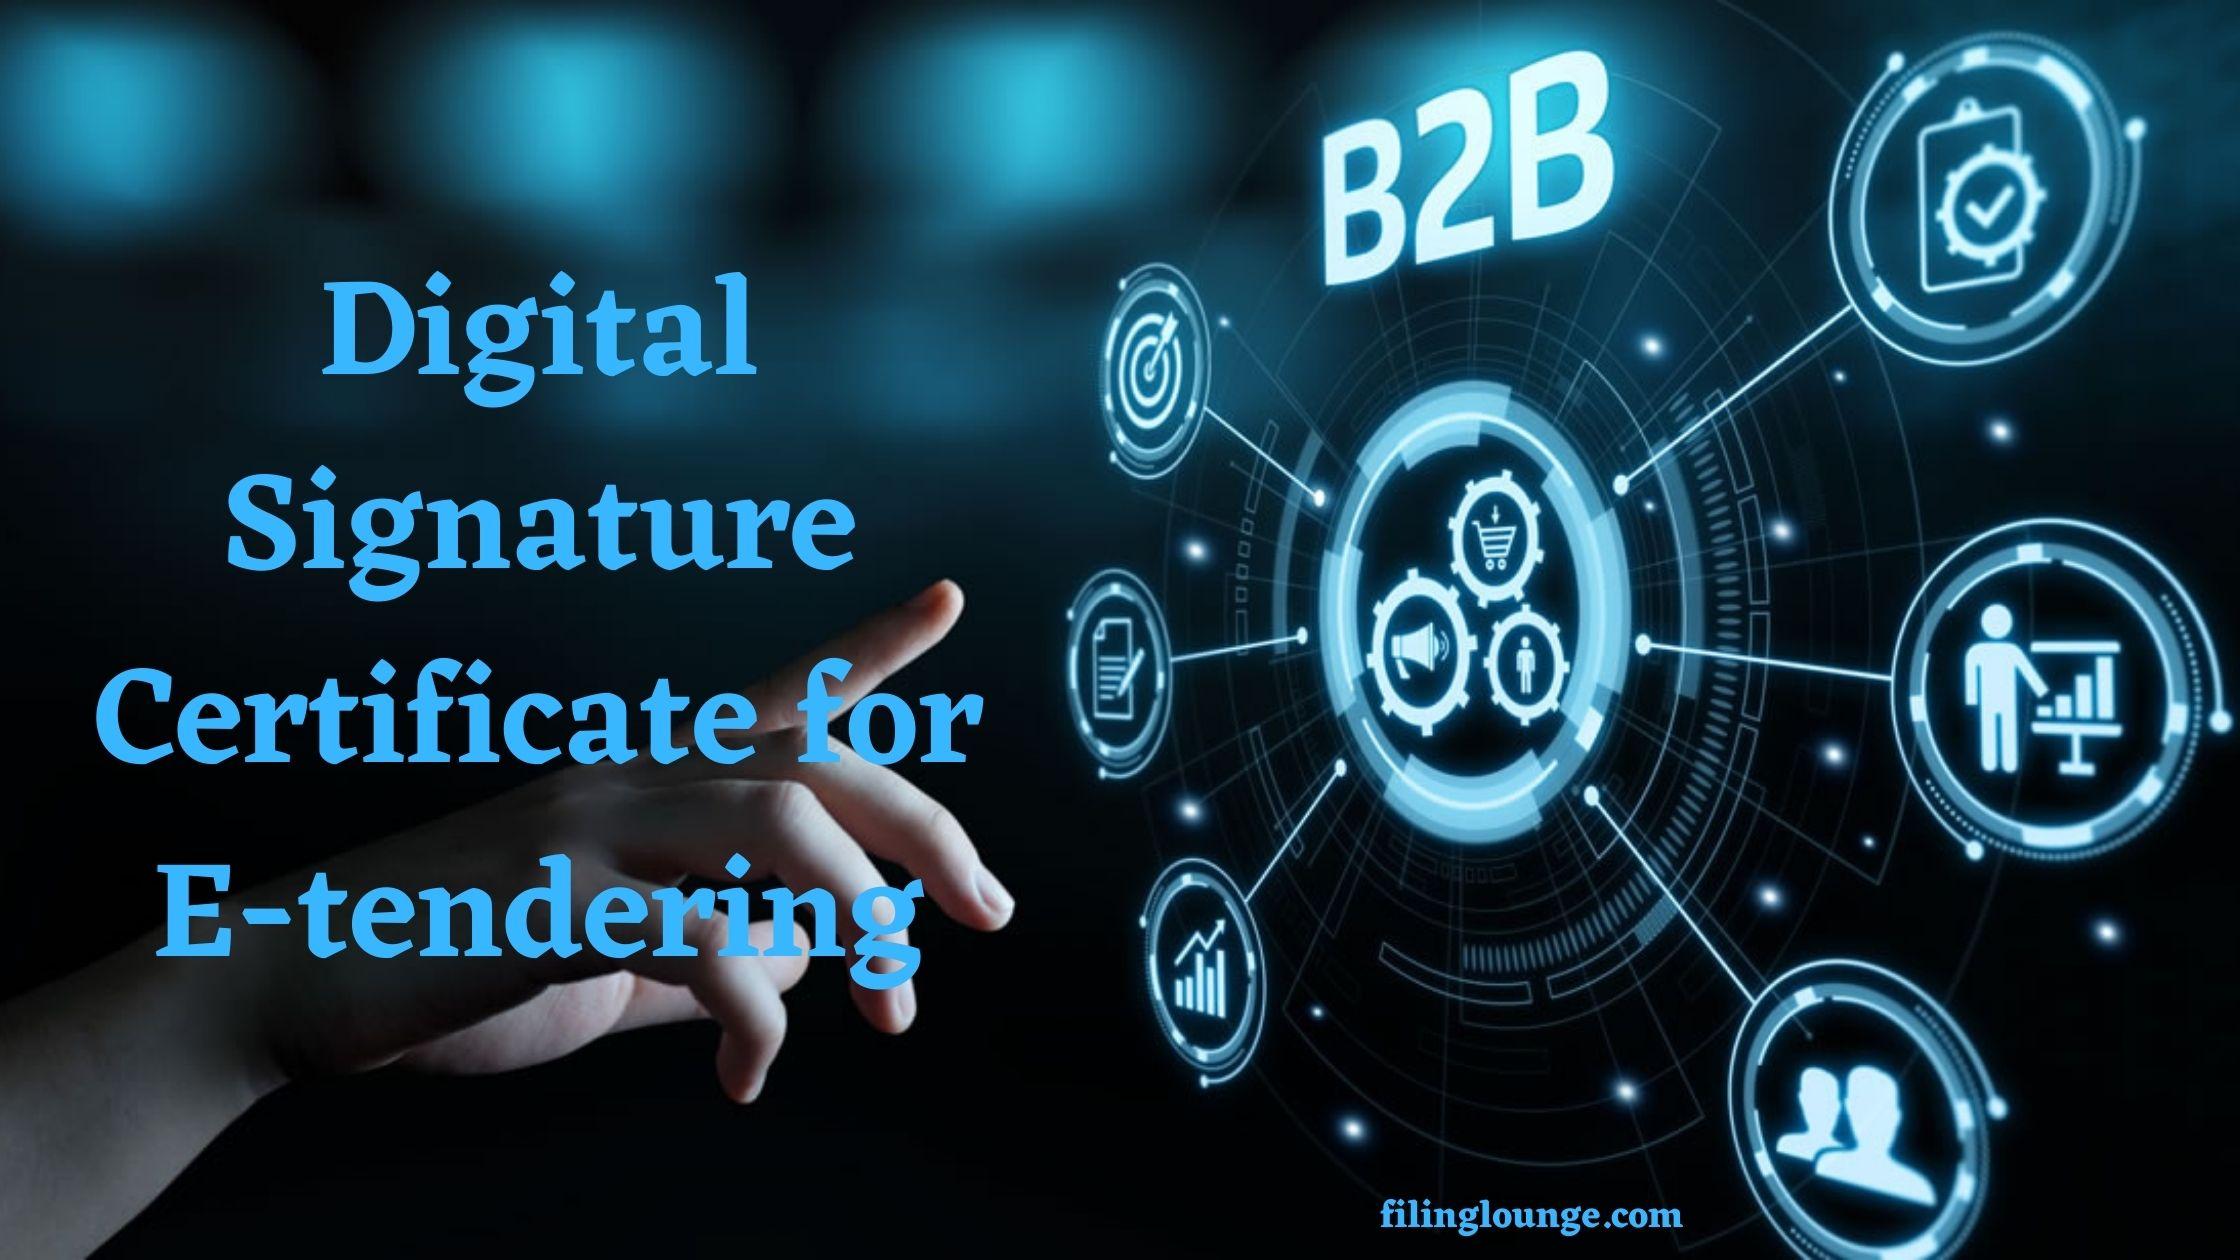 Digital Signature Certificate for E-tendering